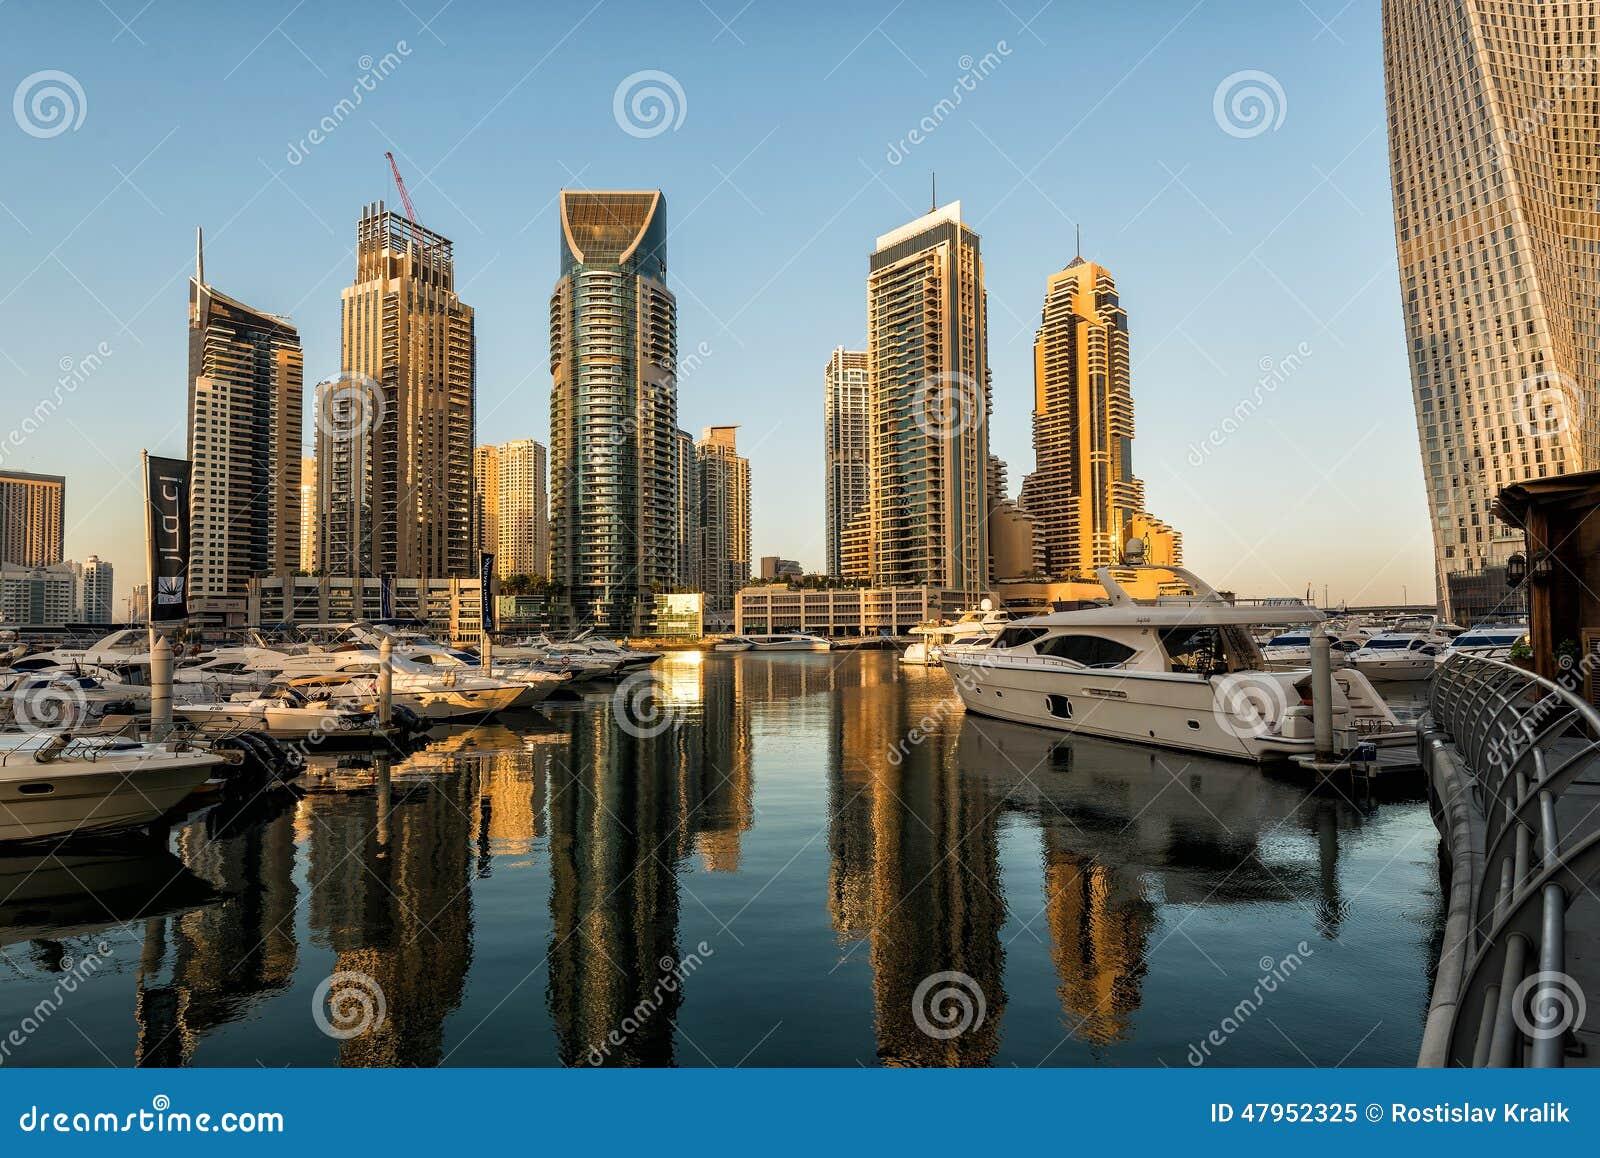 Skyscrapers in sunrise dubai marina editorial image for Luxury hotels in dubai marina